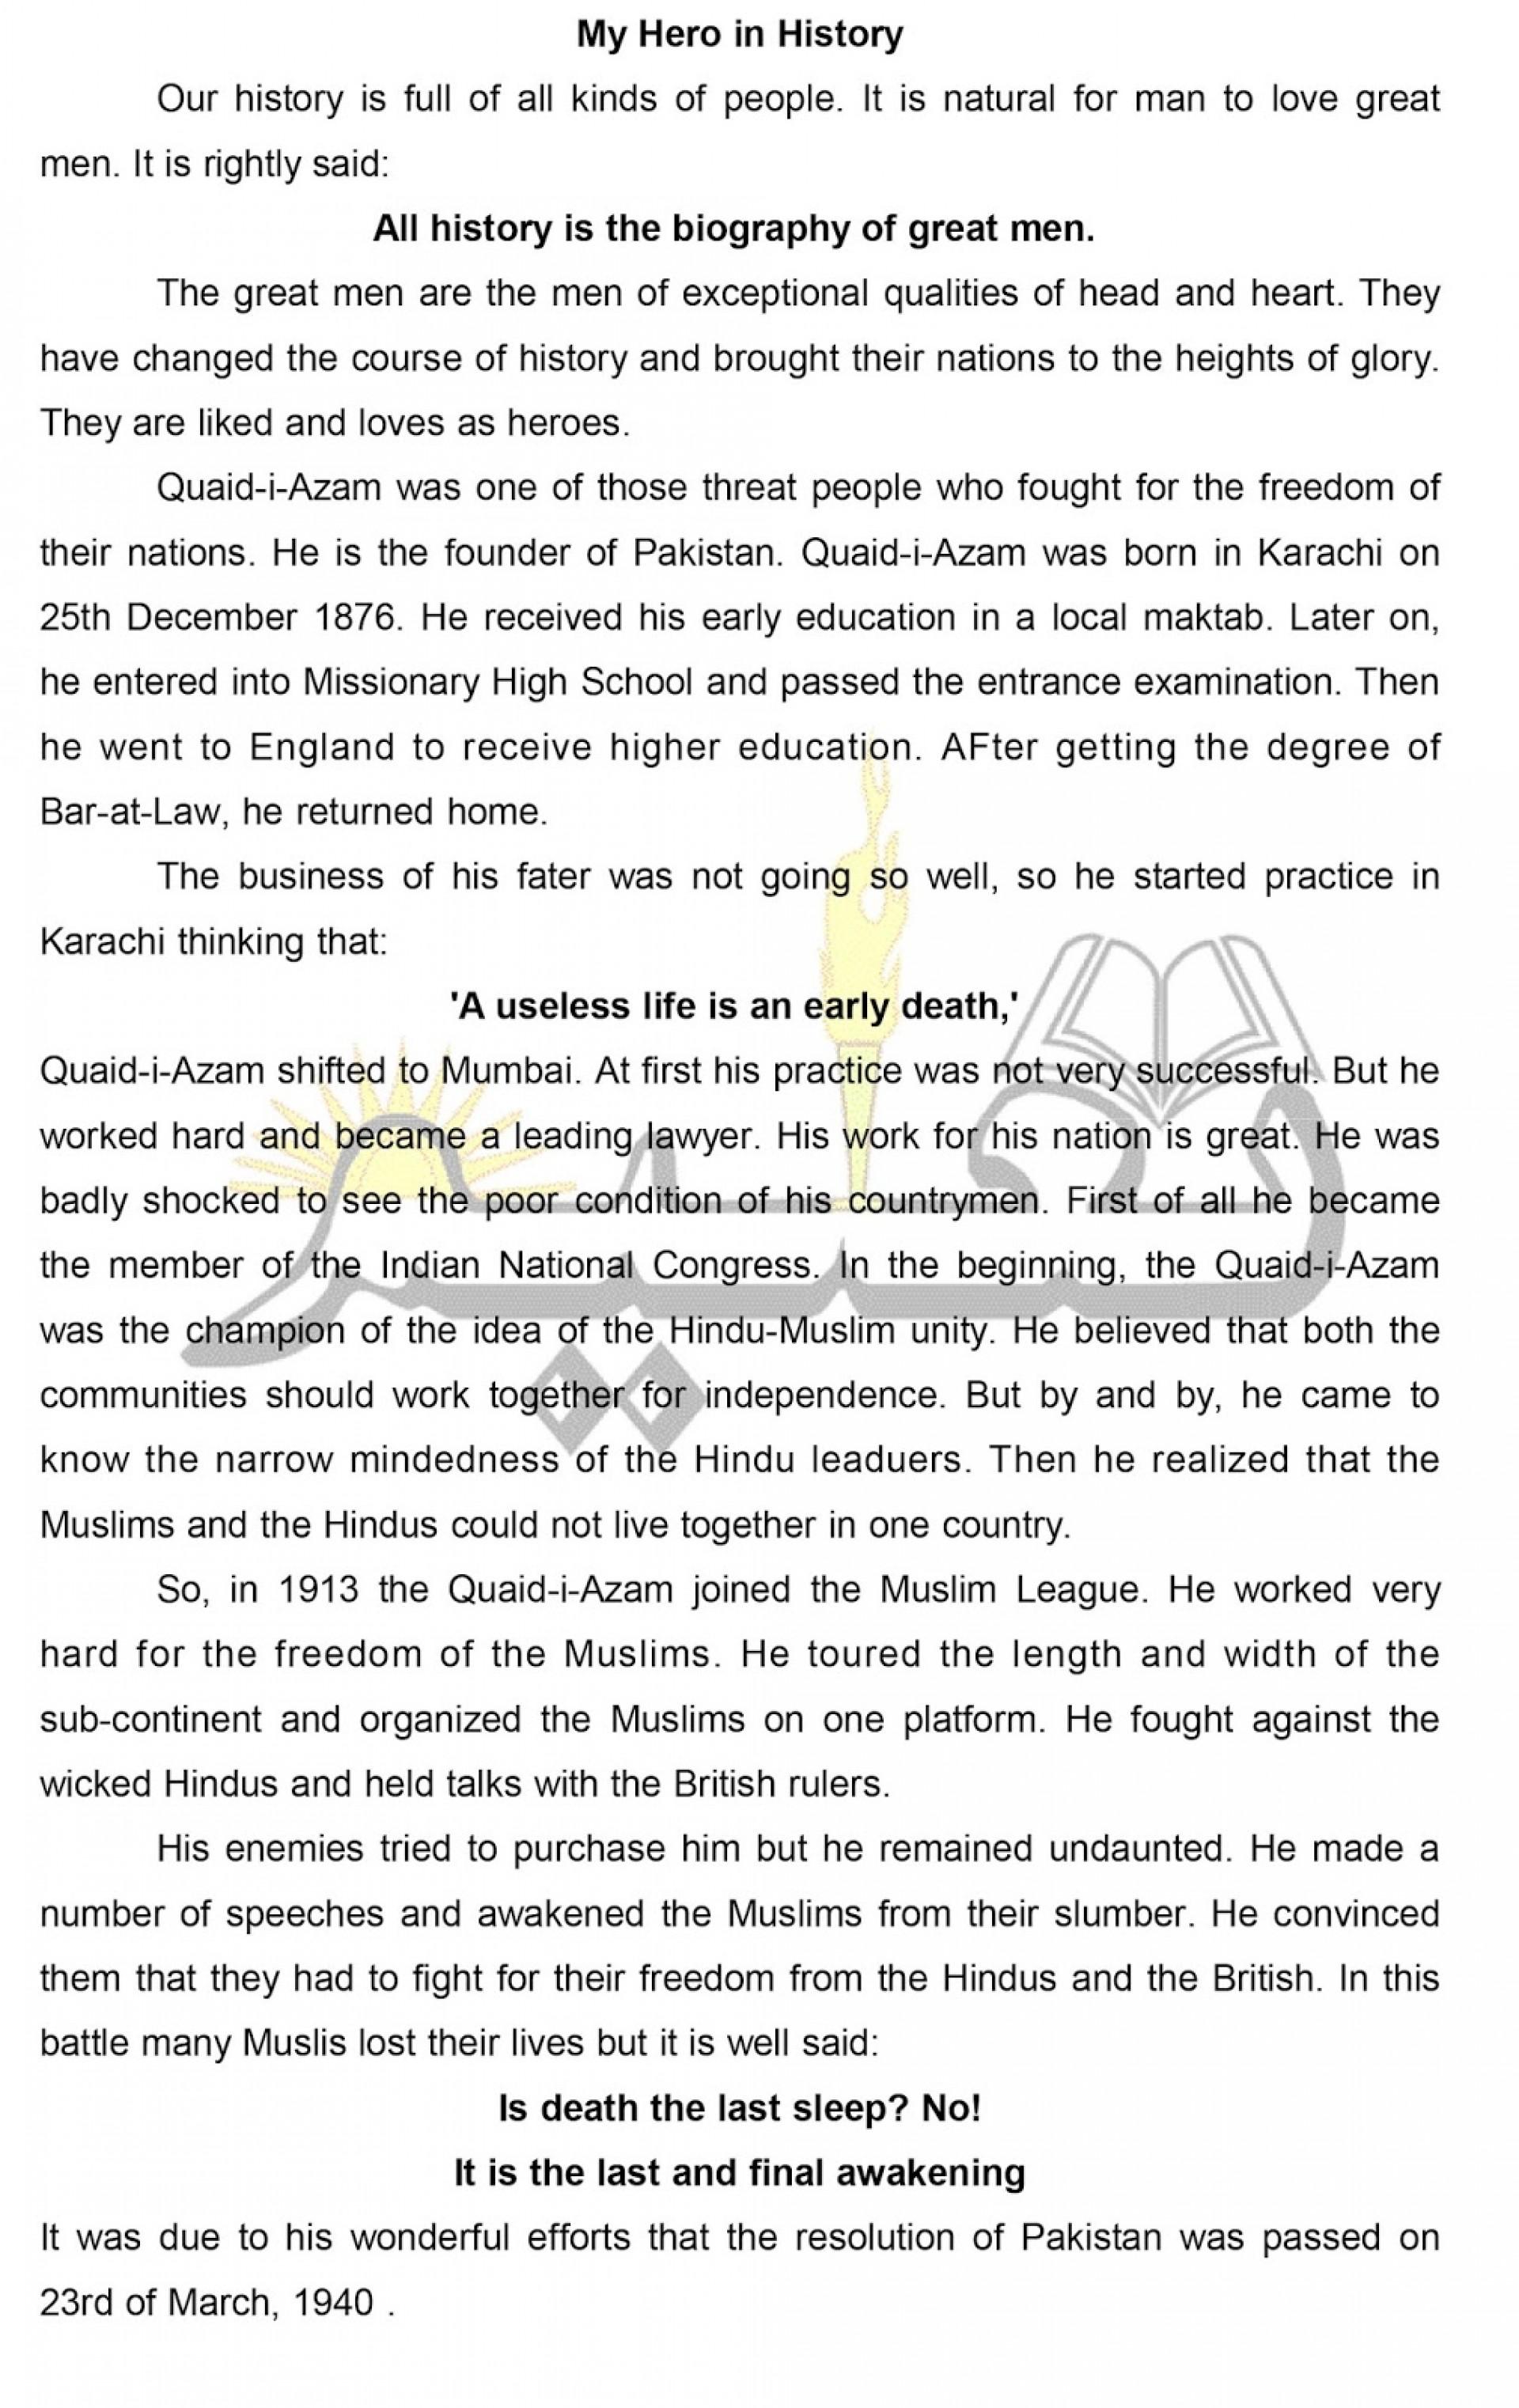 012 Essay01 An Essay About My Hero Fascinating Heroine Teacher 500 Words A Narrative 1920